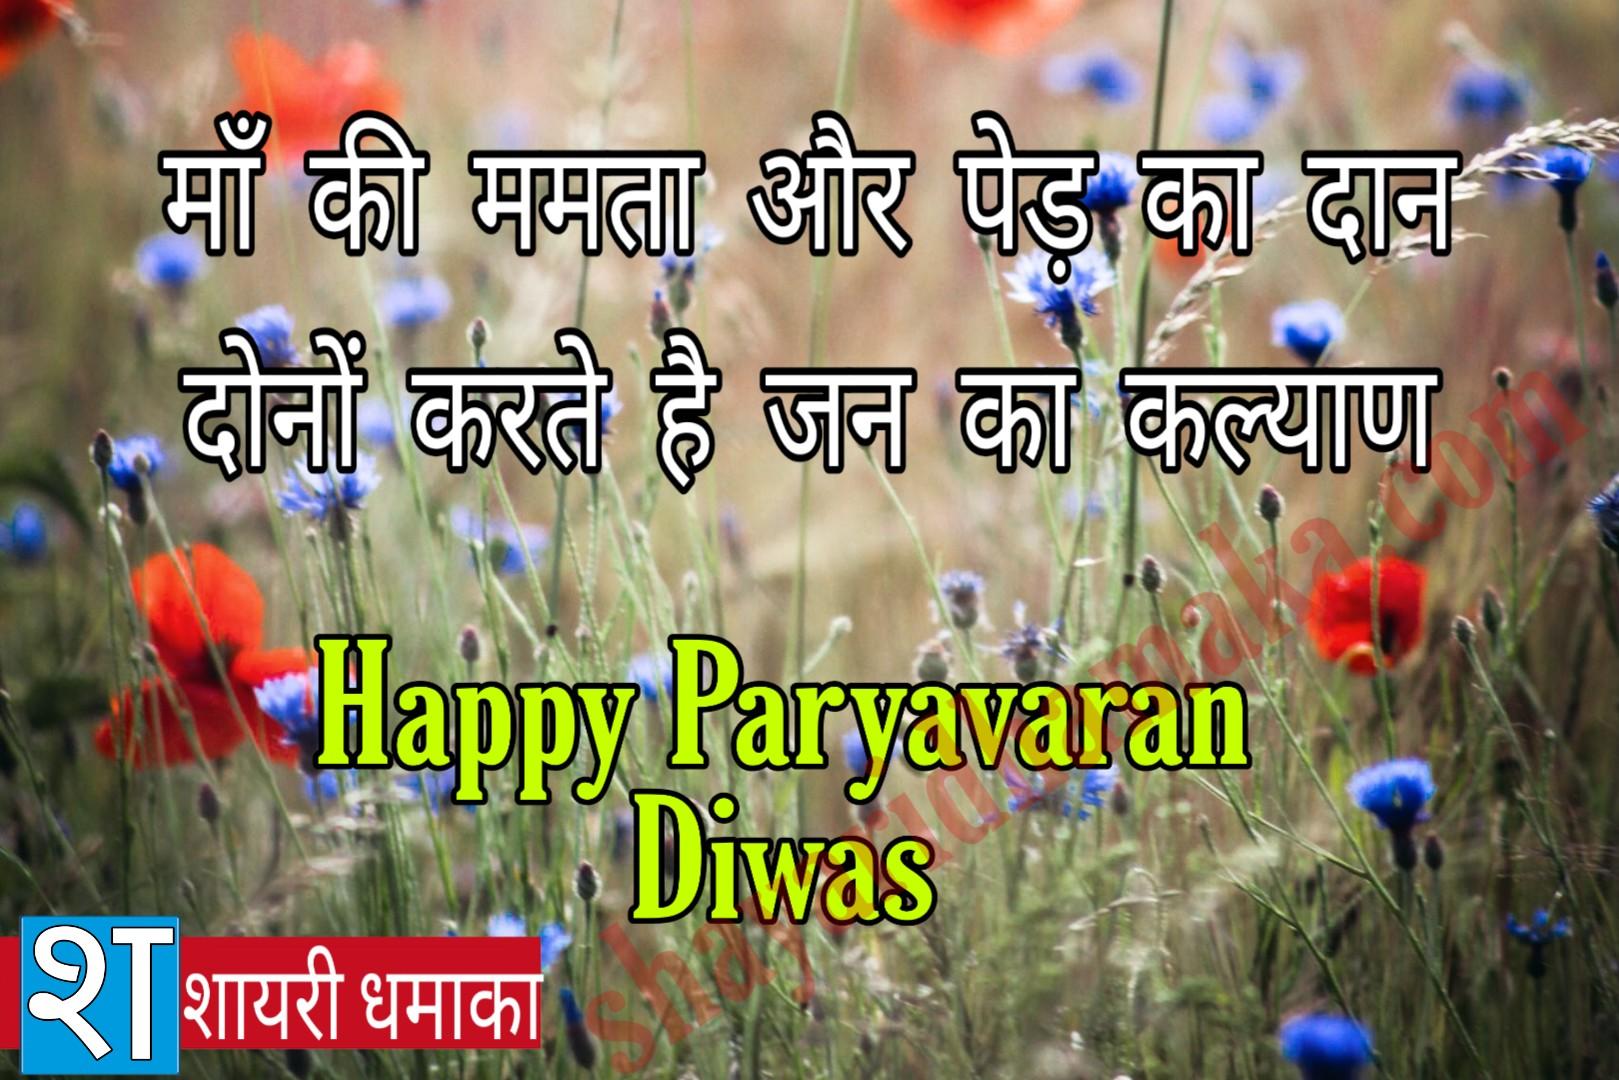 Prayavarn divas whatsapp status